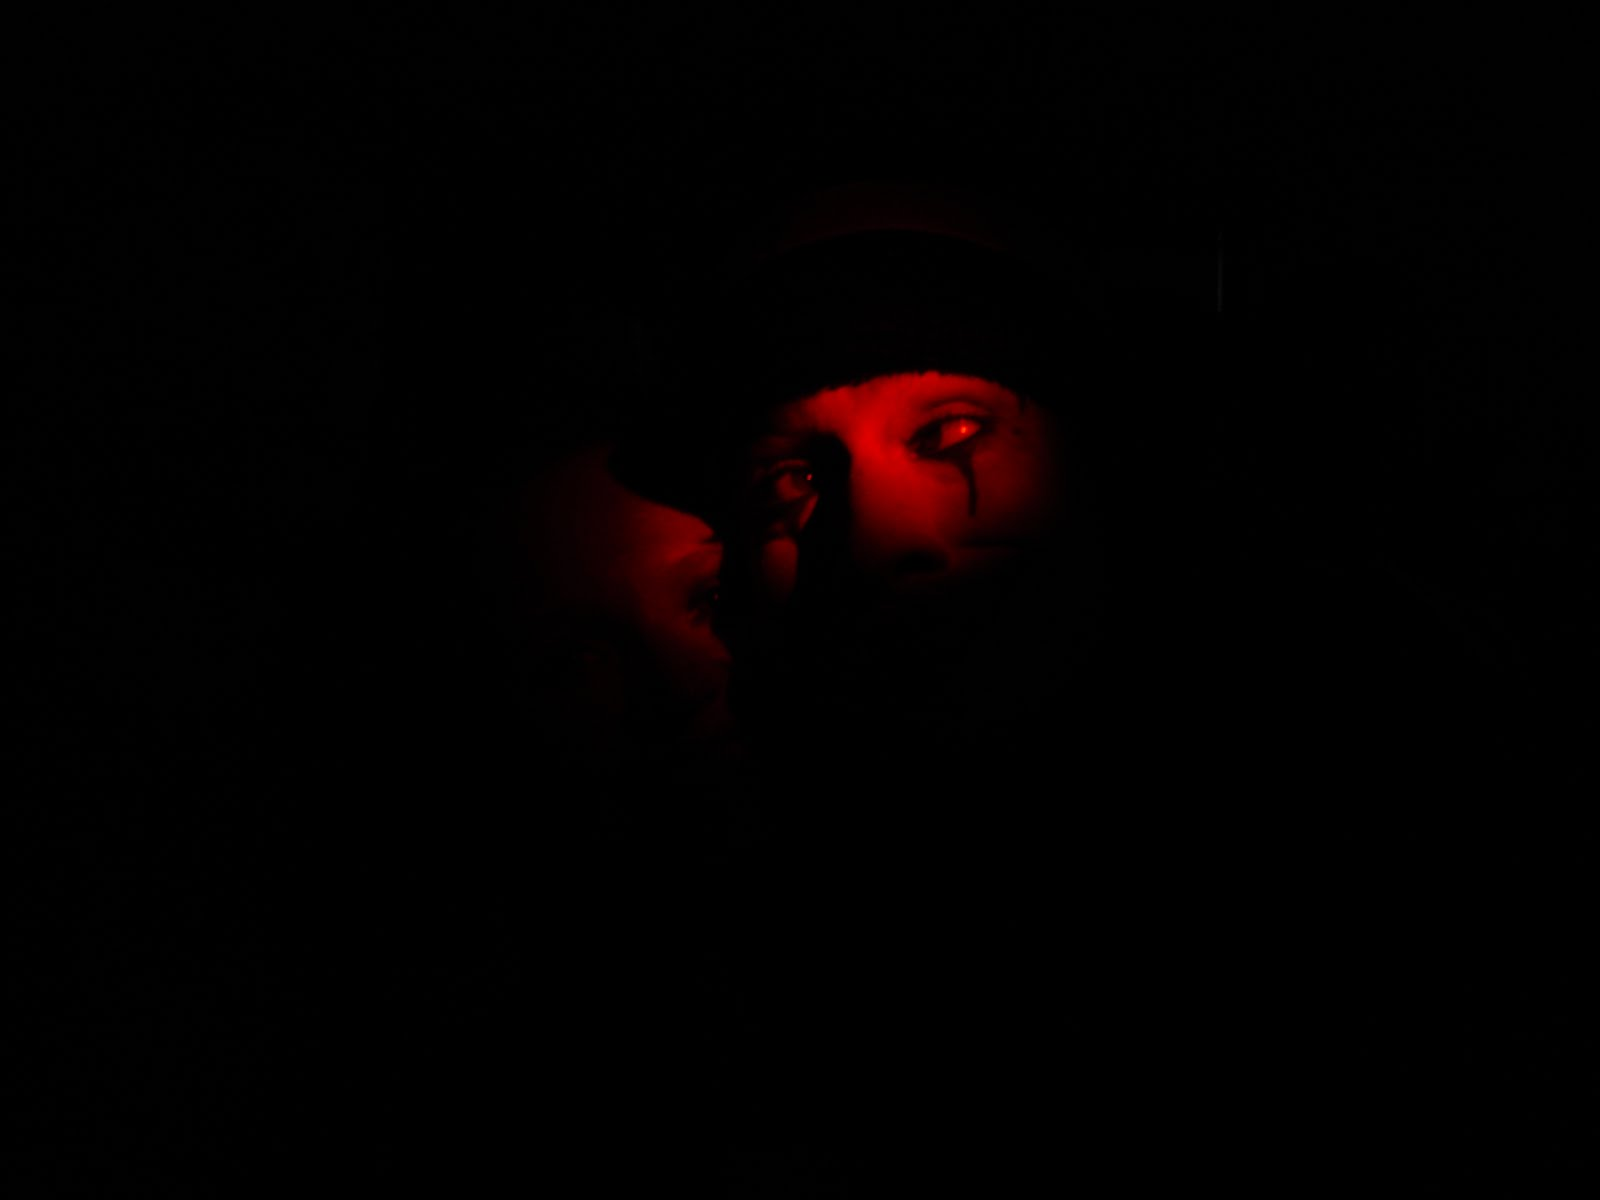 http://3.bp.blogspot.com/_uKyoBpi_Oe0/S-4VN02HZQI/AAAAAAAAAfM/CzaLZQN8NF0/s1600/Fotos+Show+Teatro+Magico+029.jpg